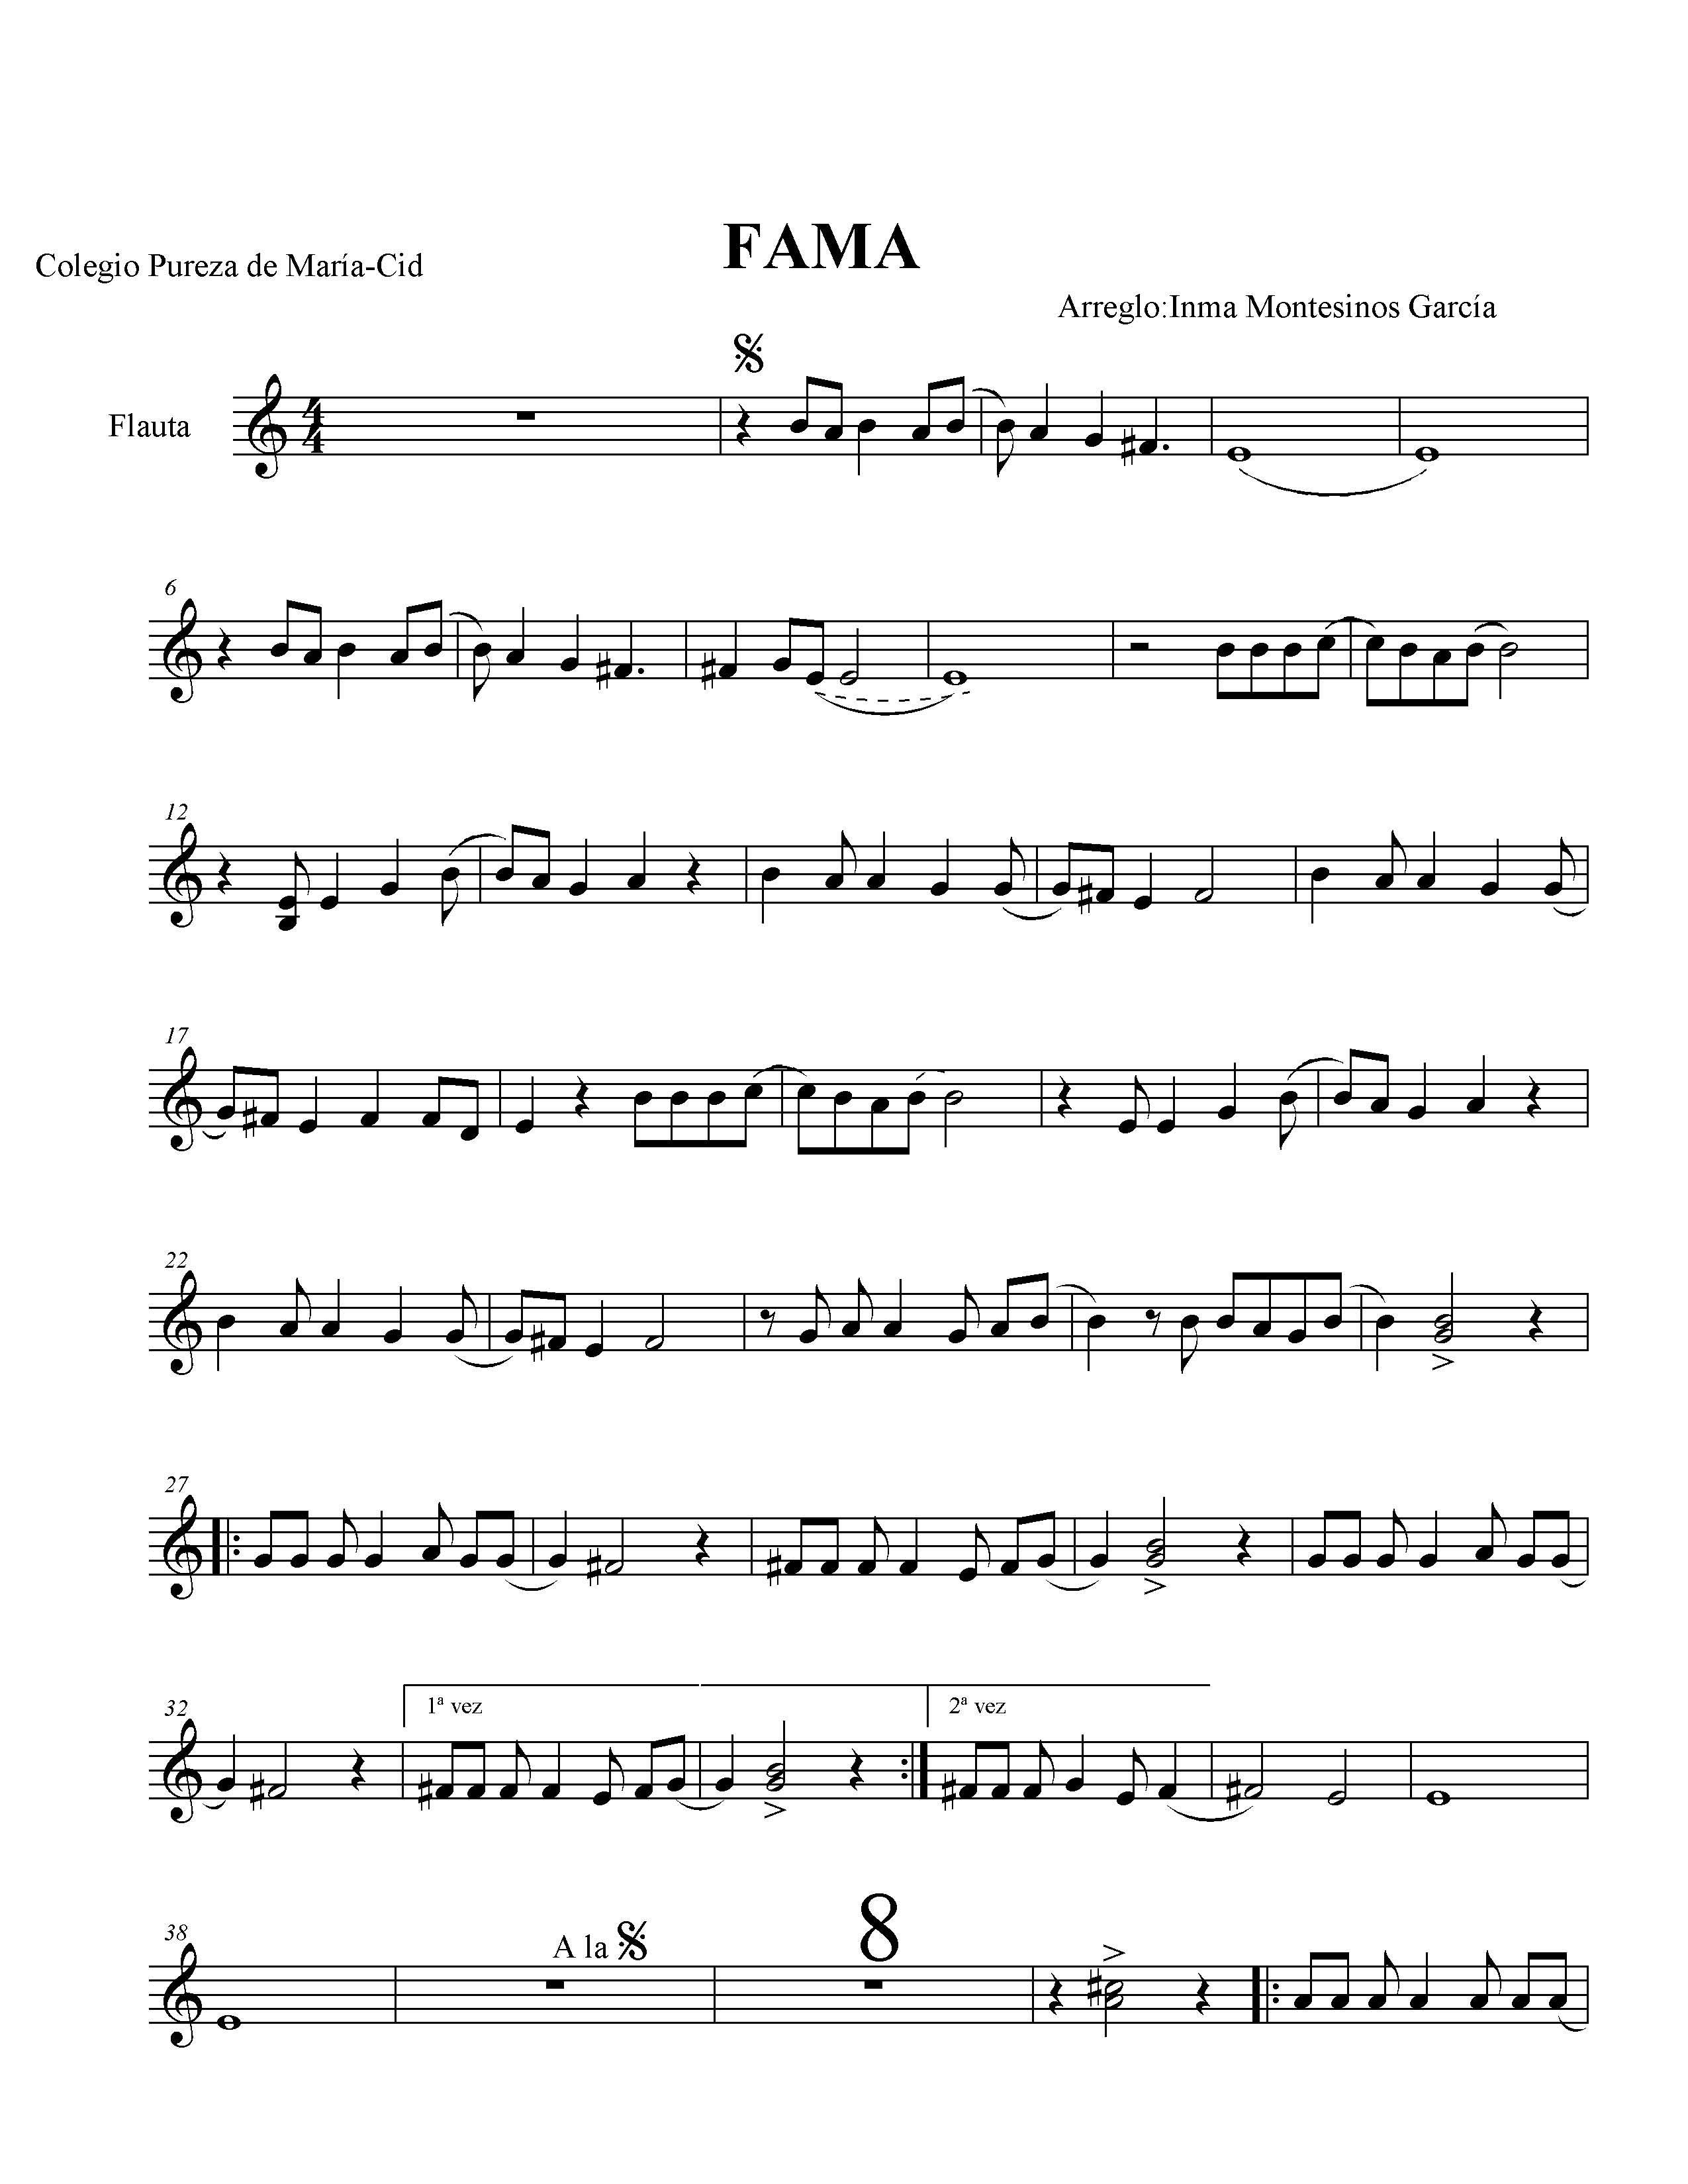 Jason Molina - Let Me Go Let Me Go Let Me Go